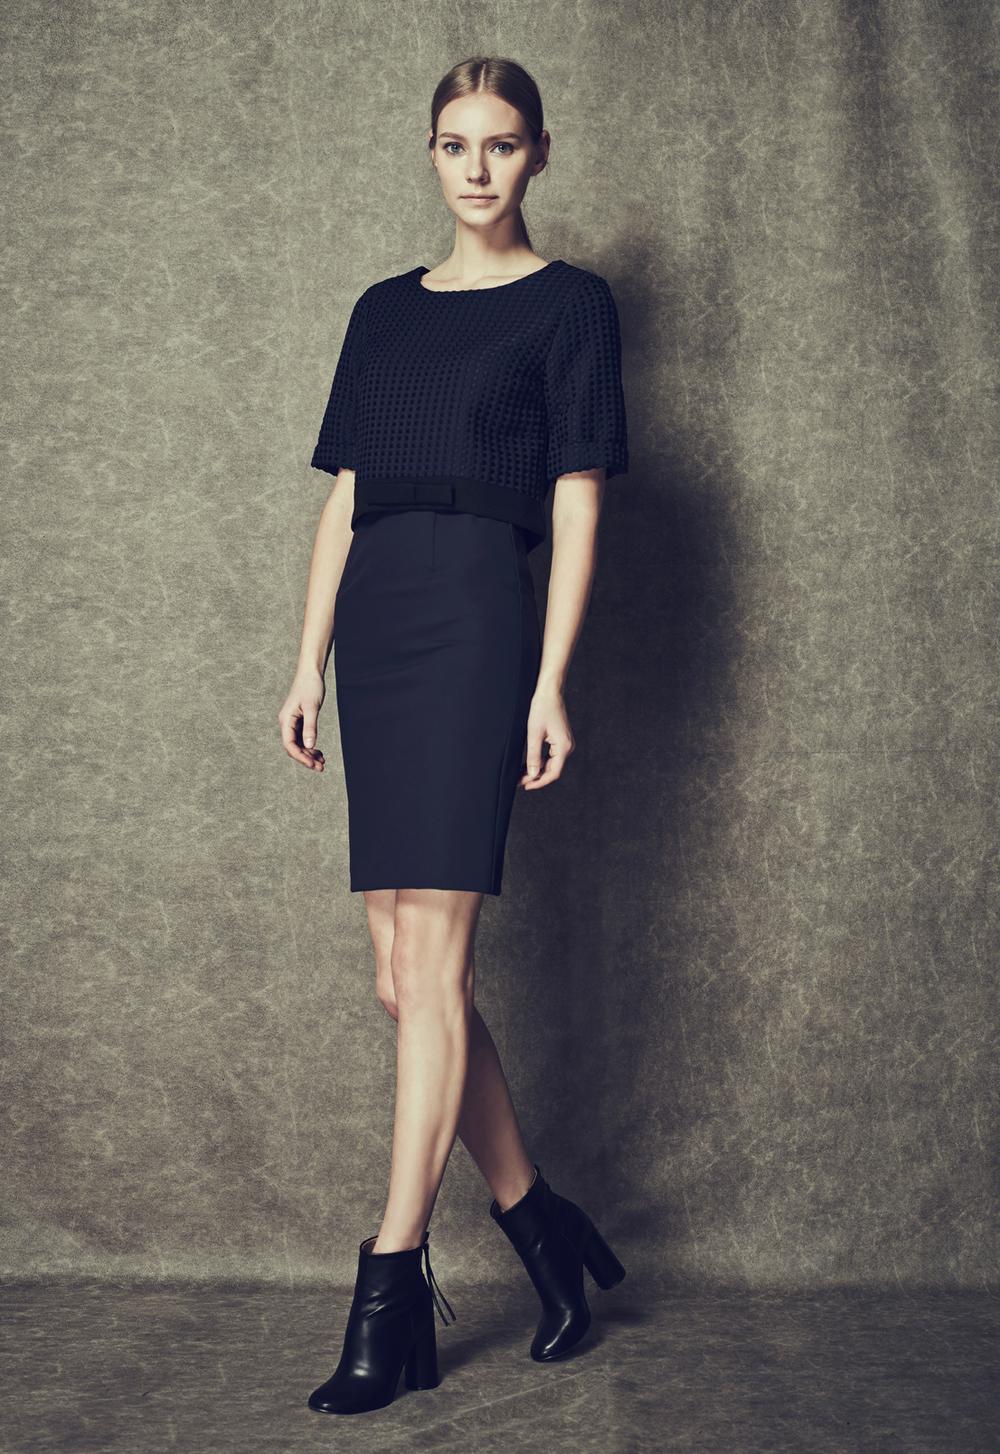 Classy Top & Classy Skirt